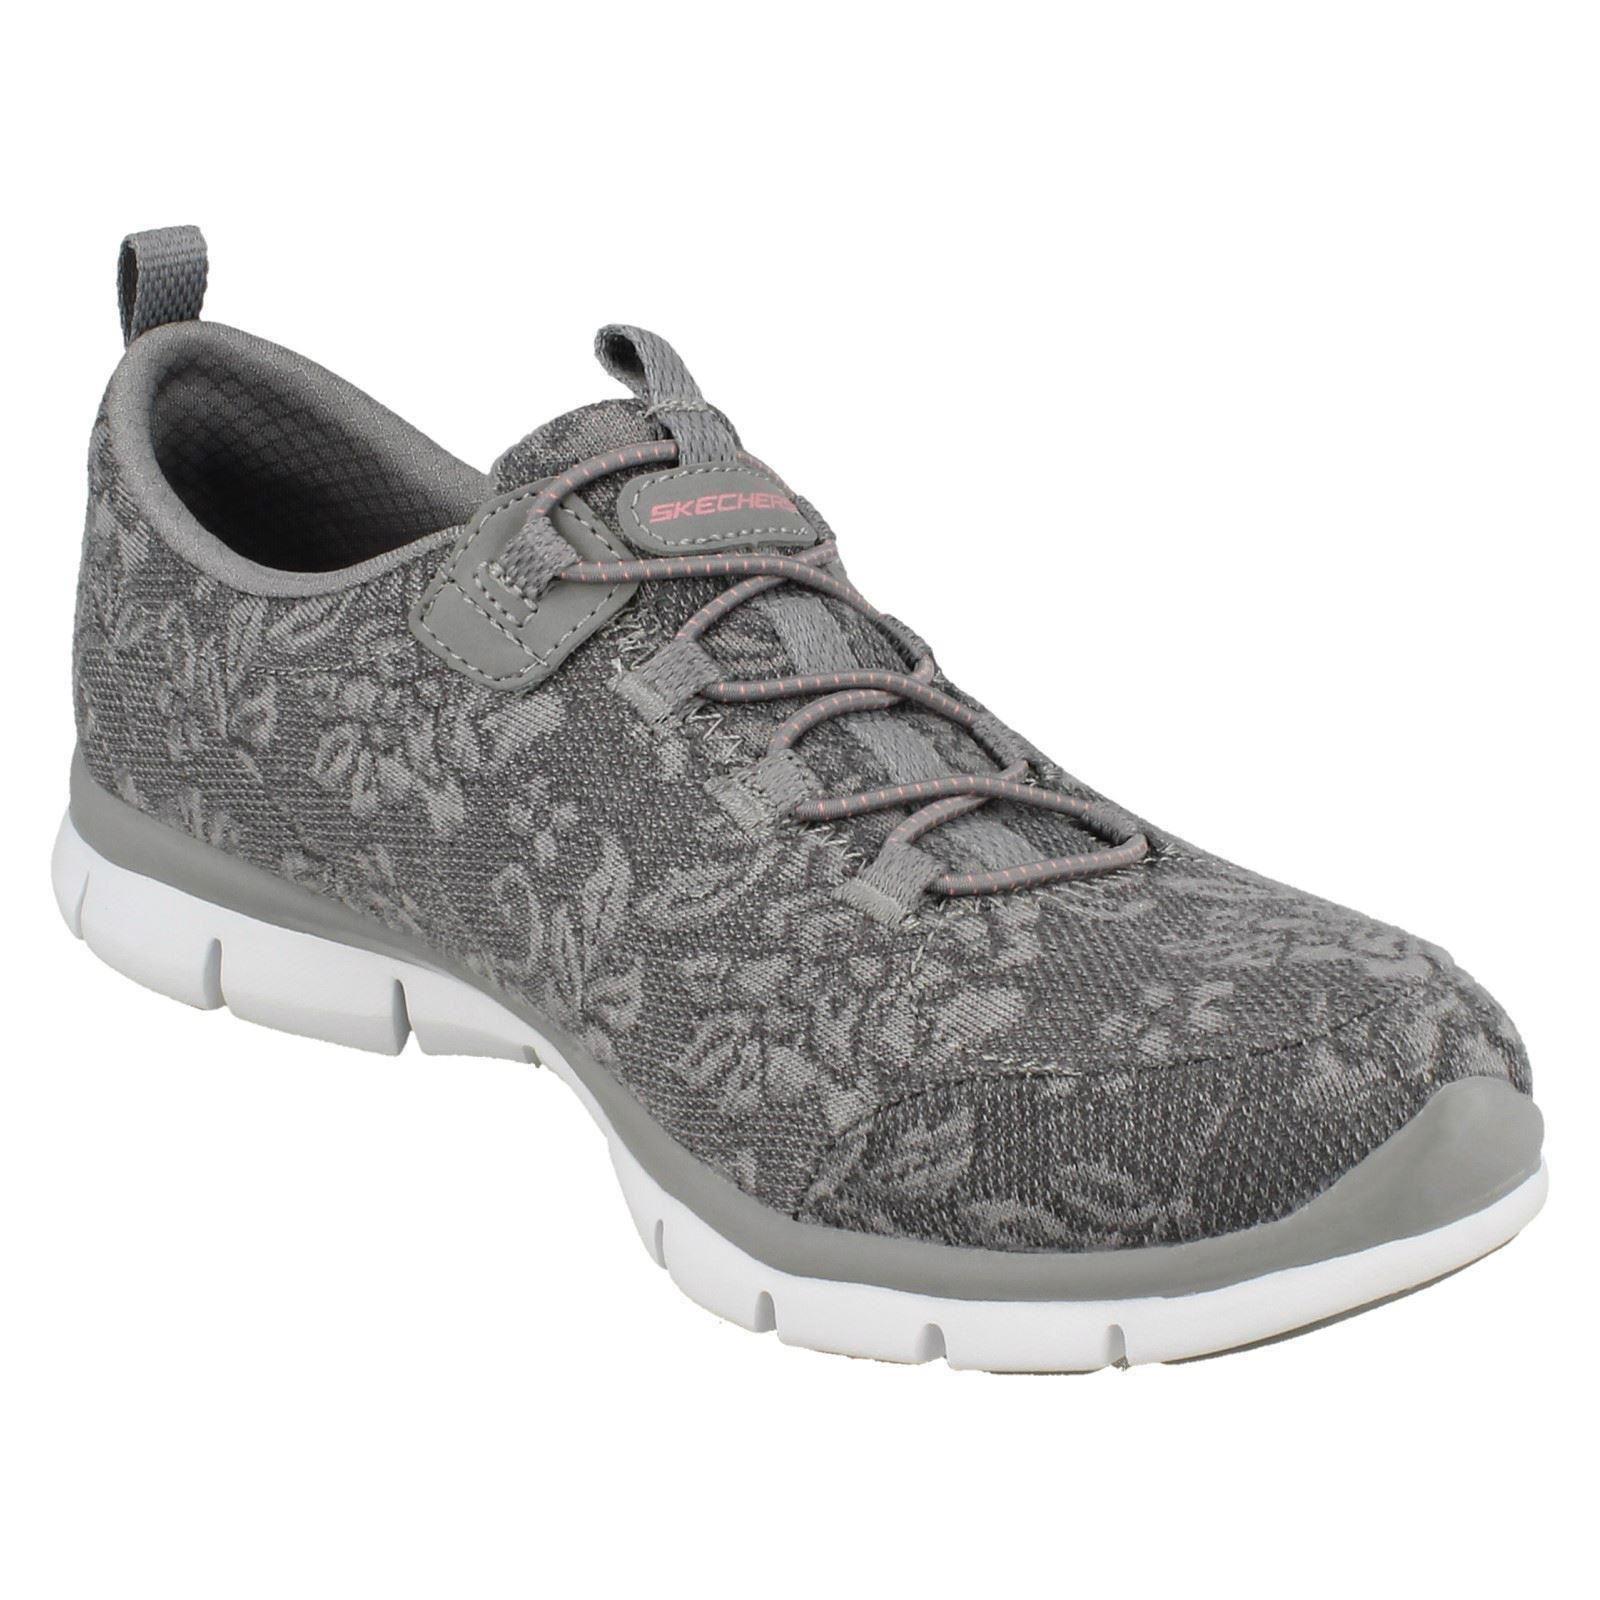 Skechers Scarpe da ginnastica Donna Dettaglio in in in Pizzo-Lacey 22764 b3d150